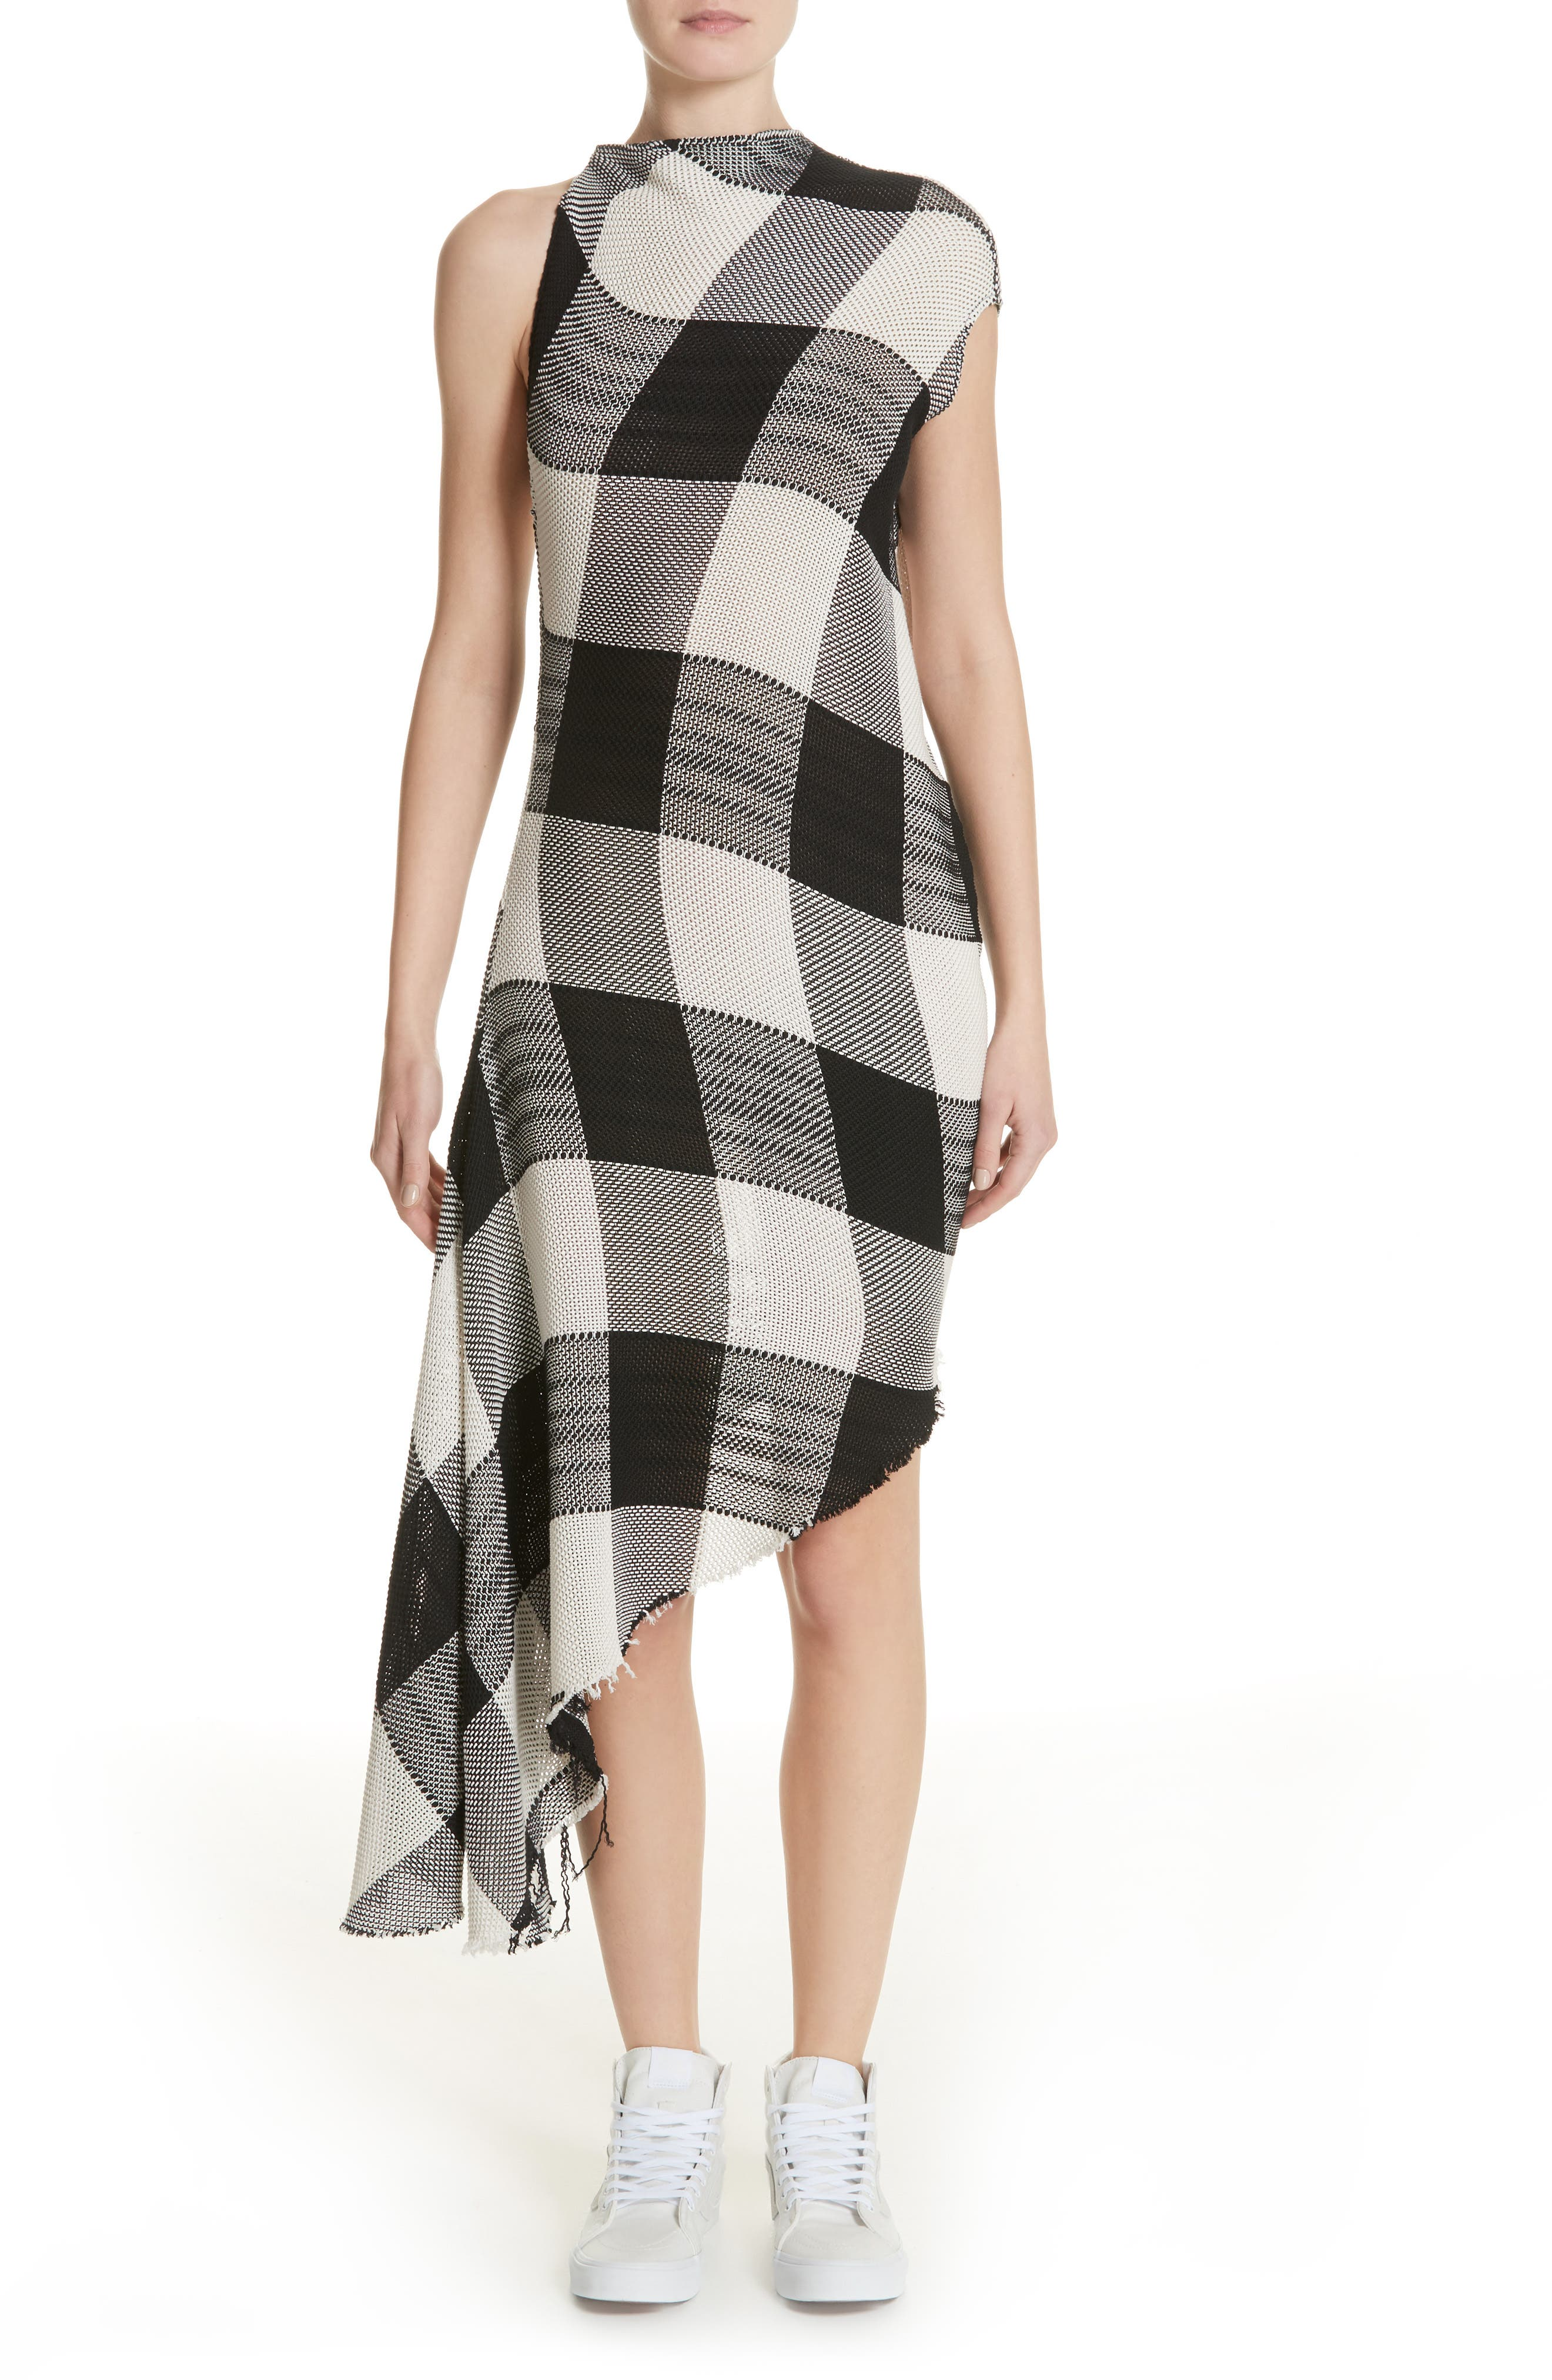 Marques'Almeida Asymmetrical Gingham Sheath Dress,                         Main,                         color, Black/White